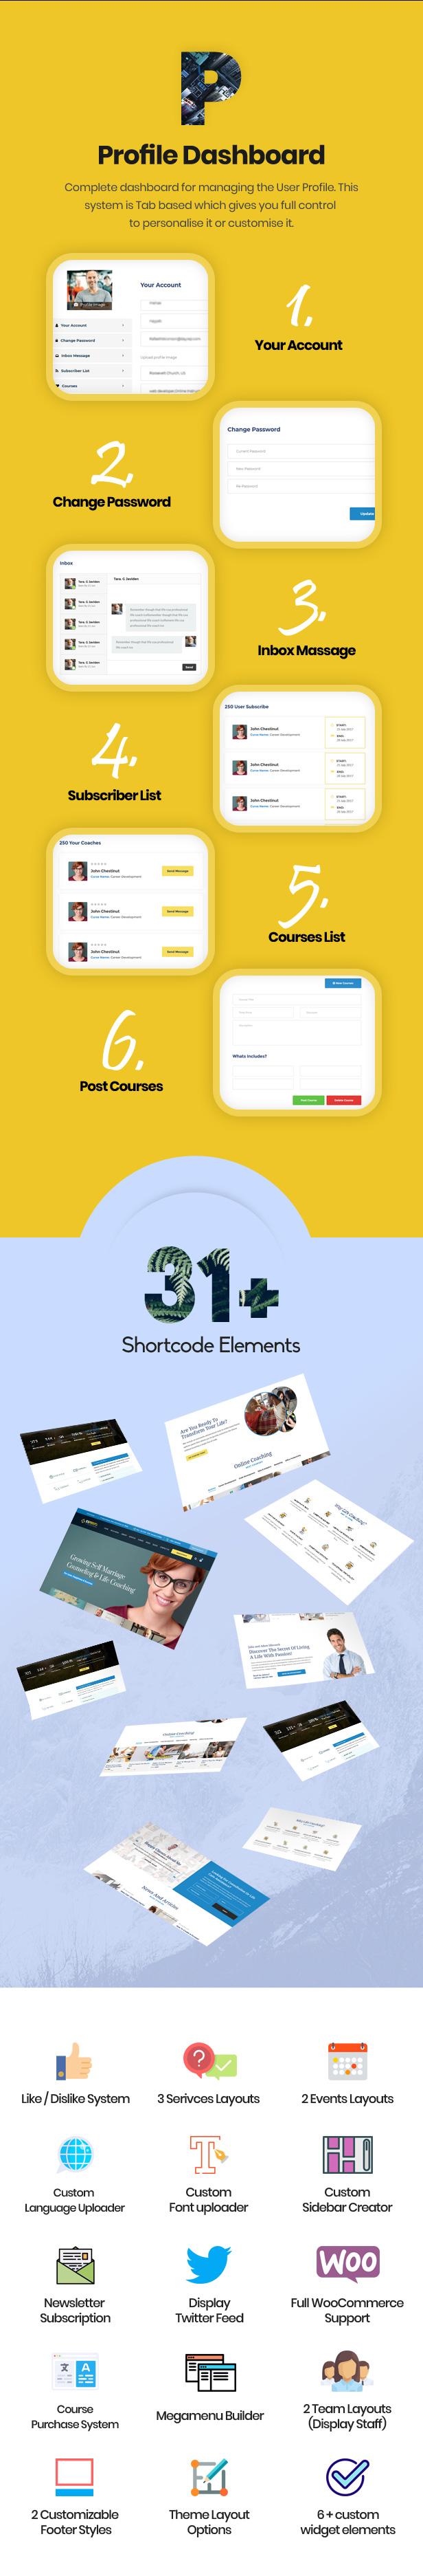 Esperto - A Consultancy and Coaching WordPress Theme - 6